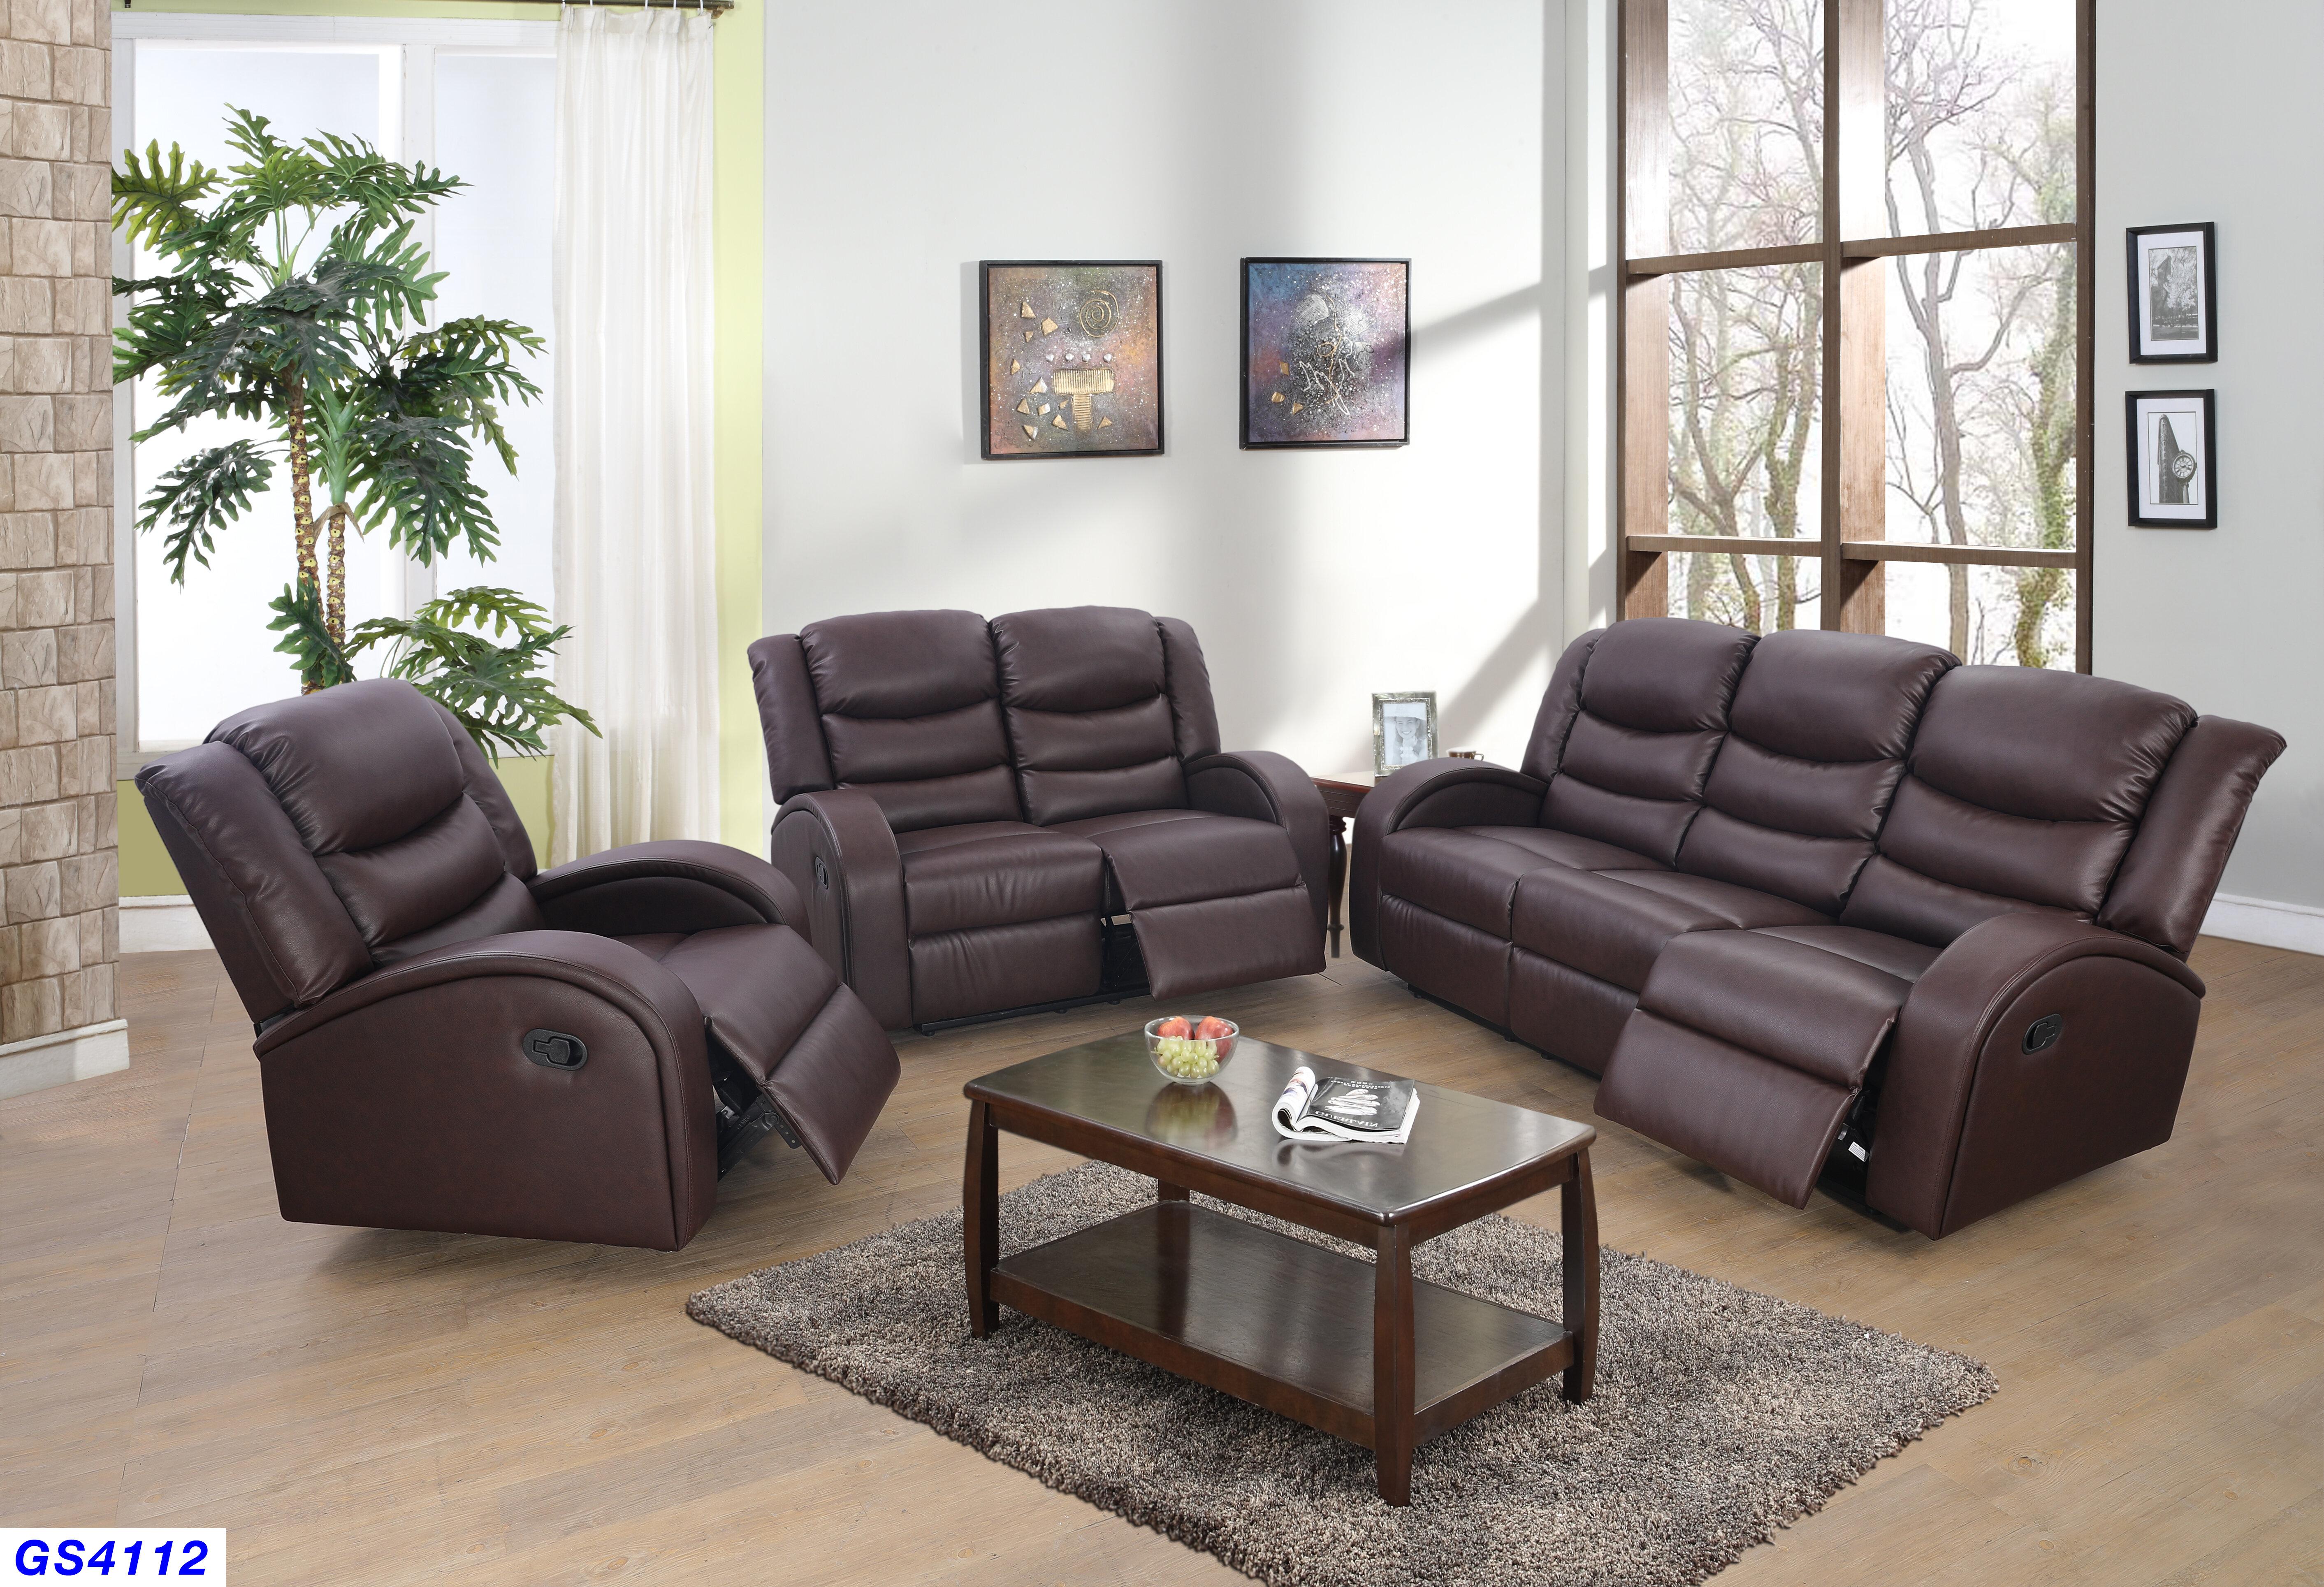 Latitude Run Mcpeak 3 Piece Living Room Set & Reviews | Wayfair